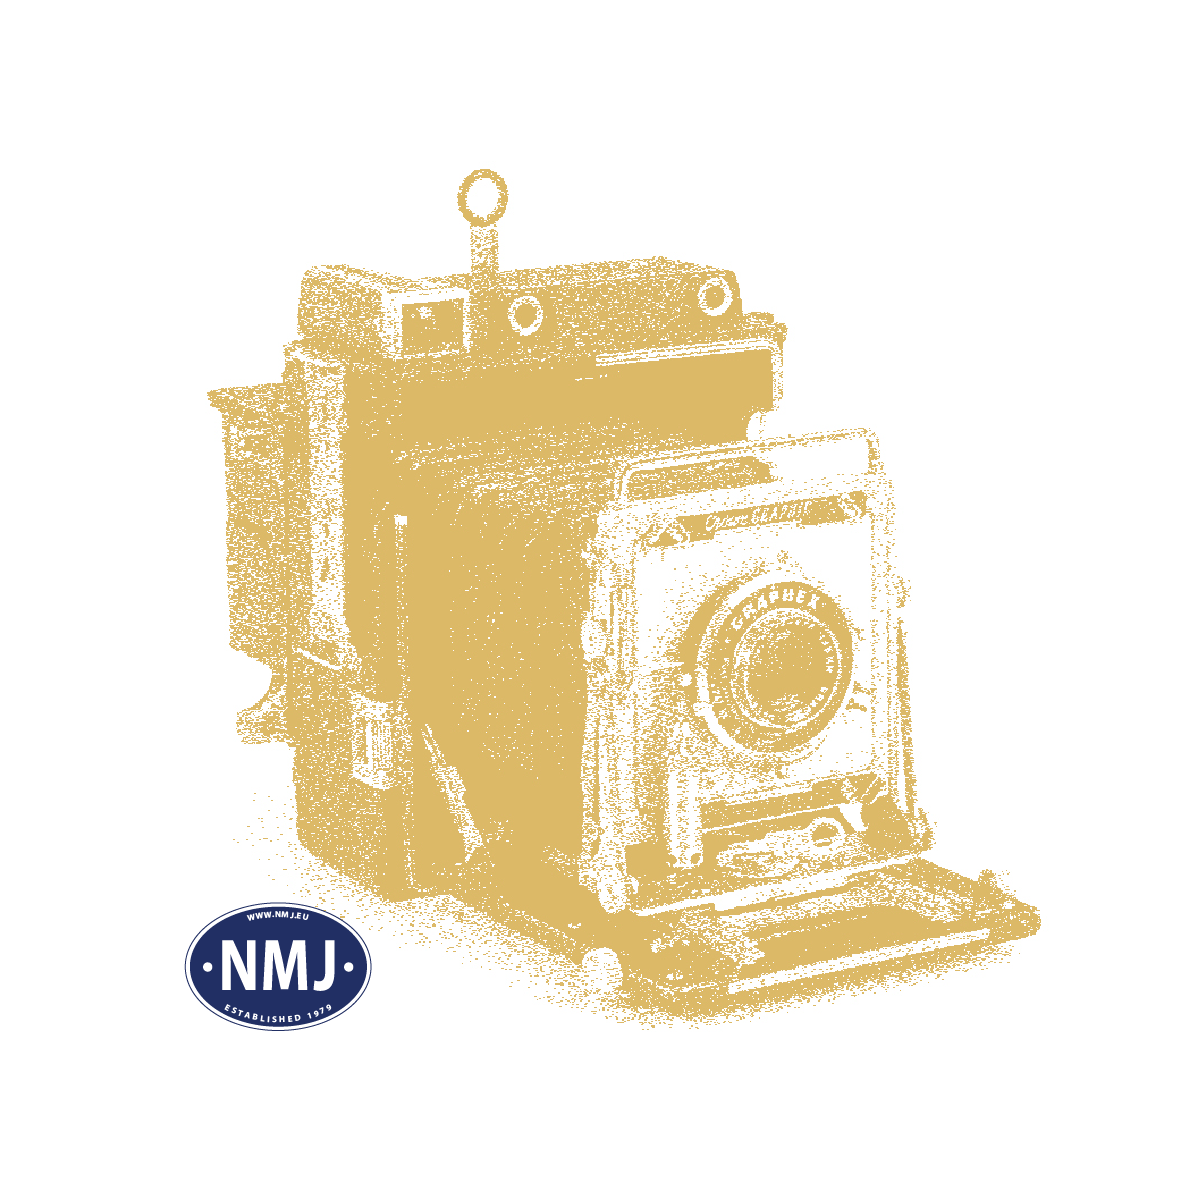 MBR51-2406 - Kanadische Pappel Sommer, 30-40cm, 0+1